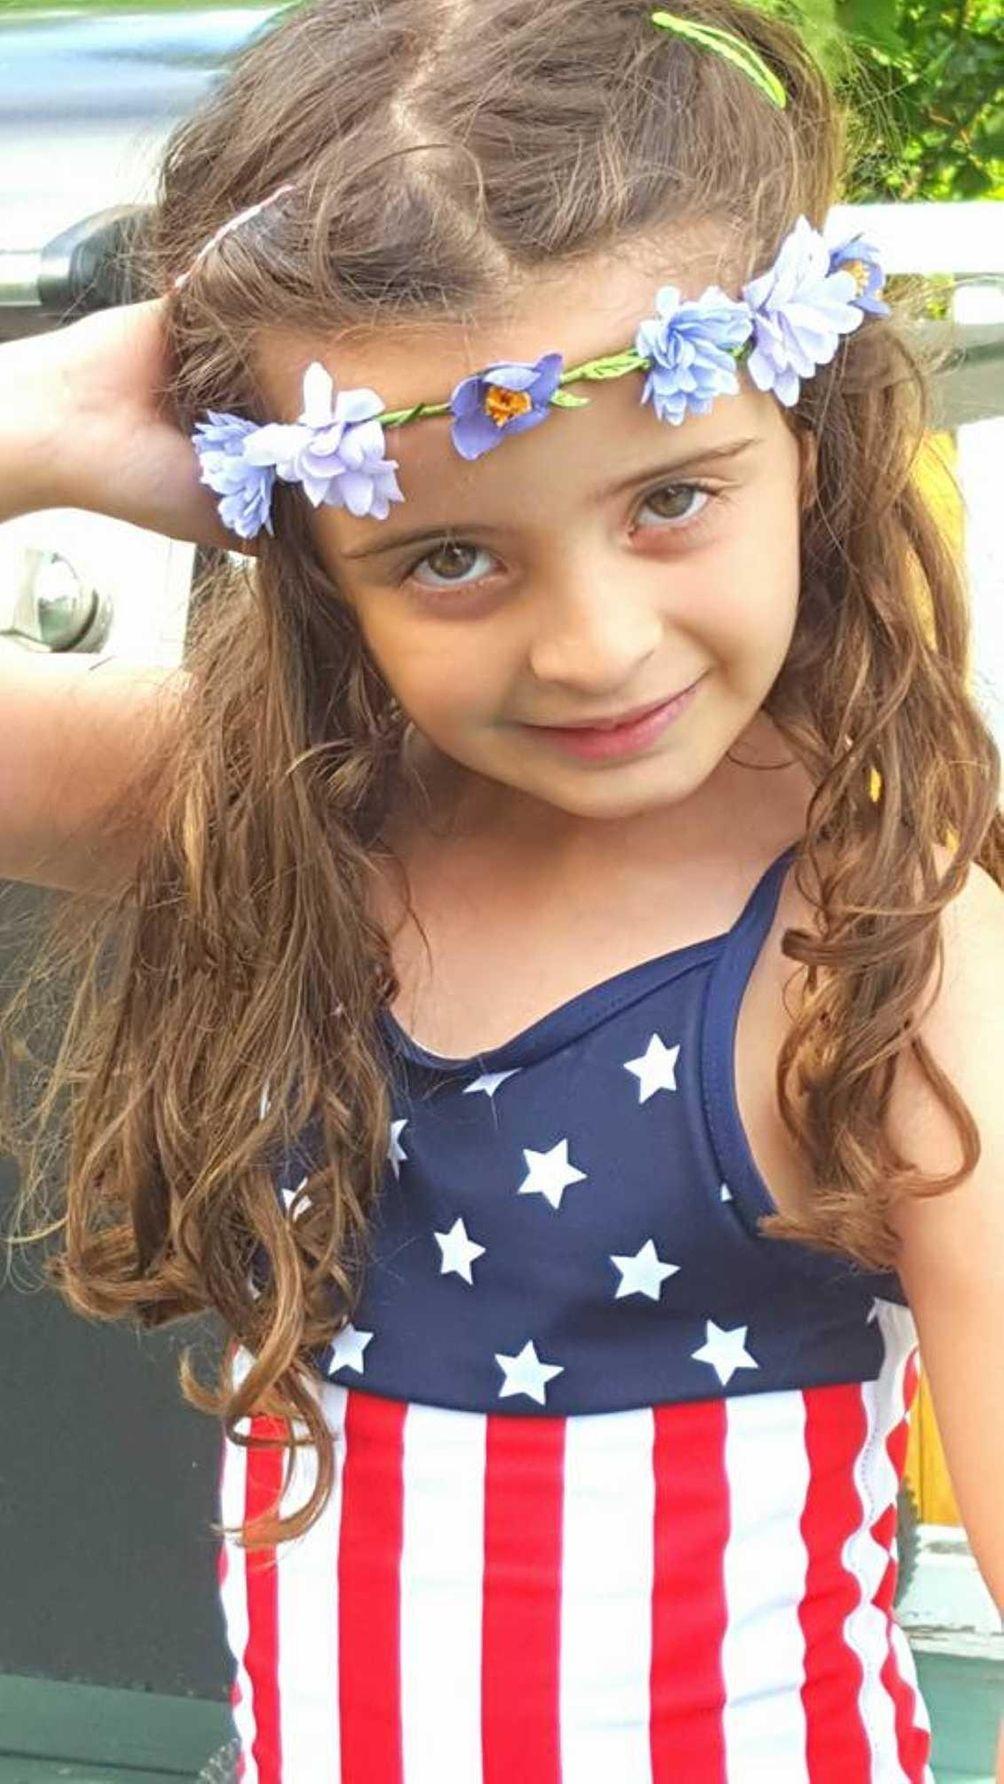 Emma wearing her Stars and Stripes, enjoying 4th